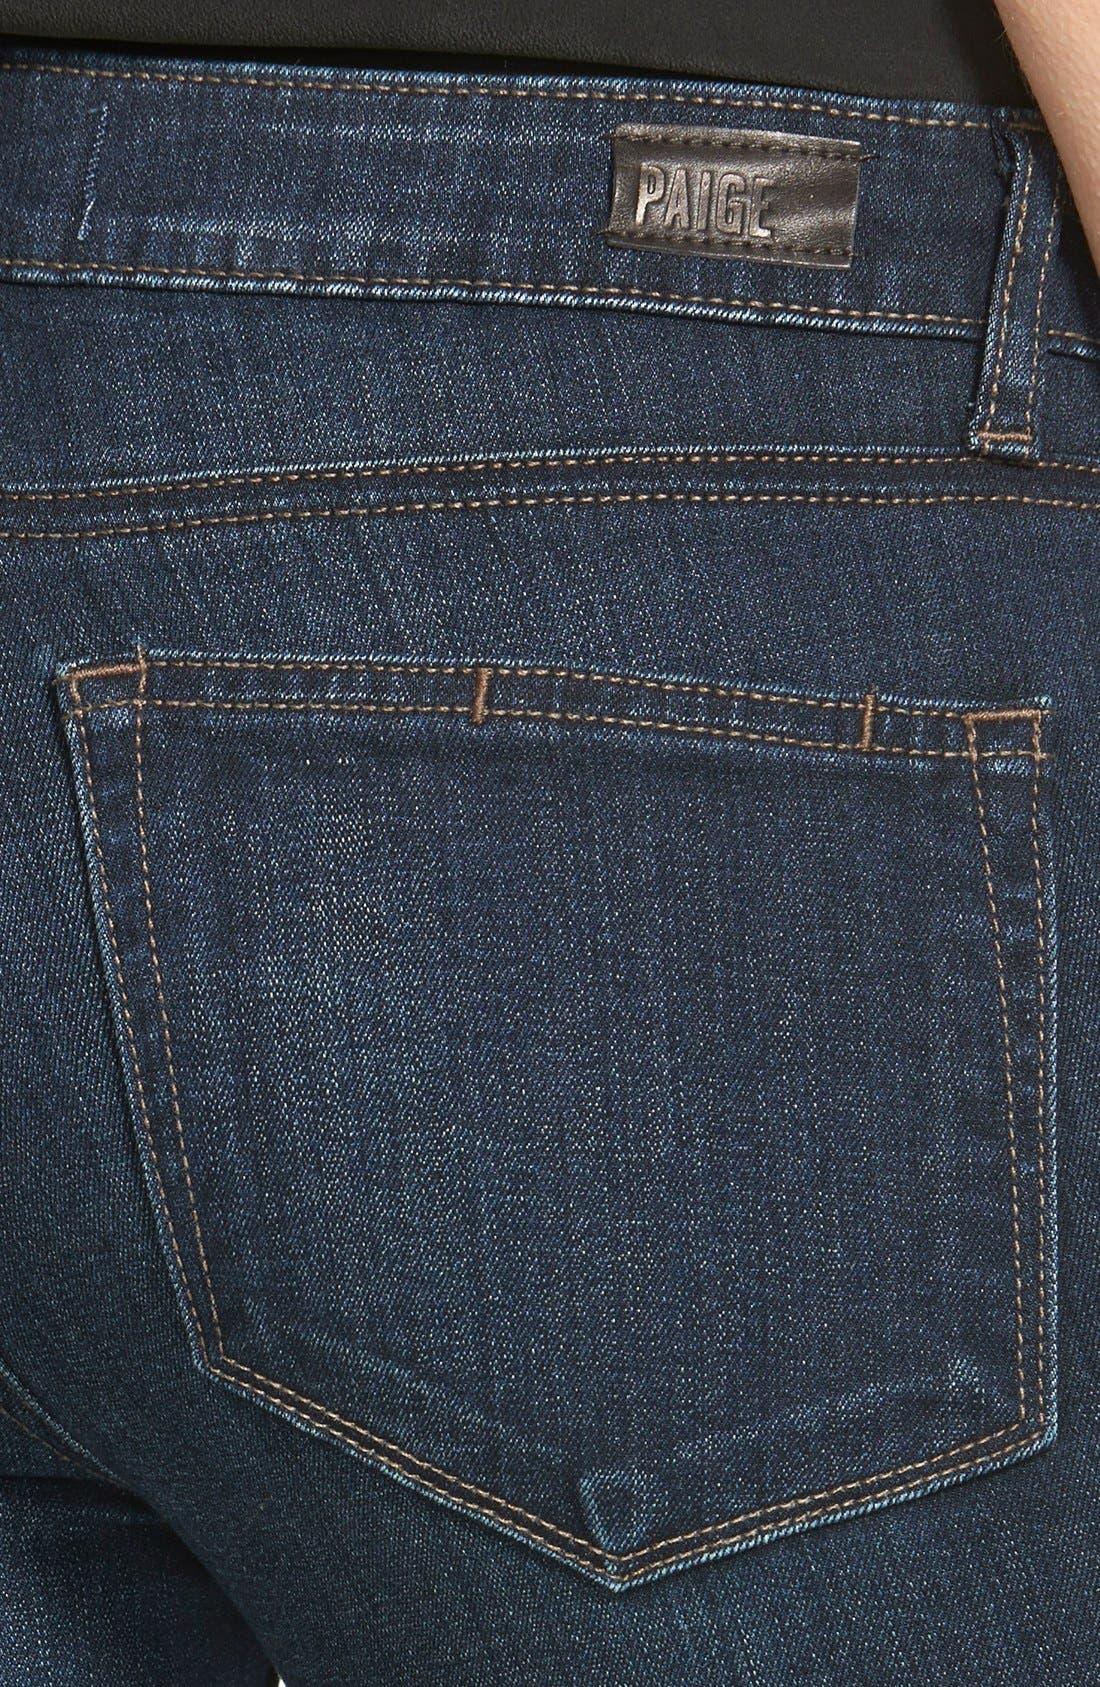 Alternate Image 3  - PAIGE 'Transcend - Verdugo' Ultra Skinny Jeans (Clark)